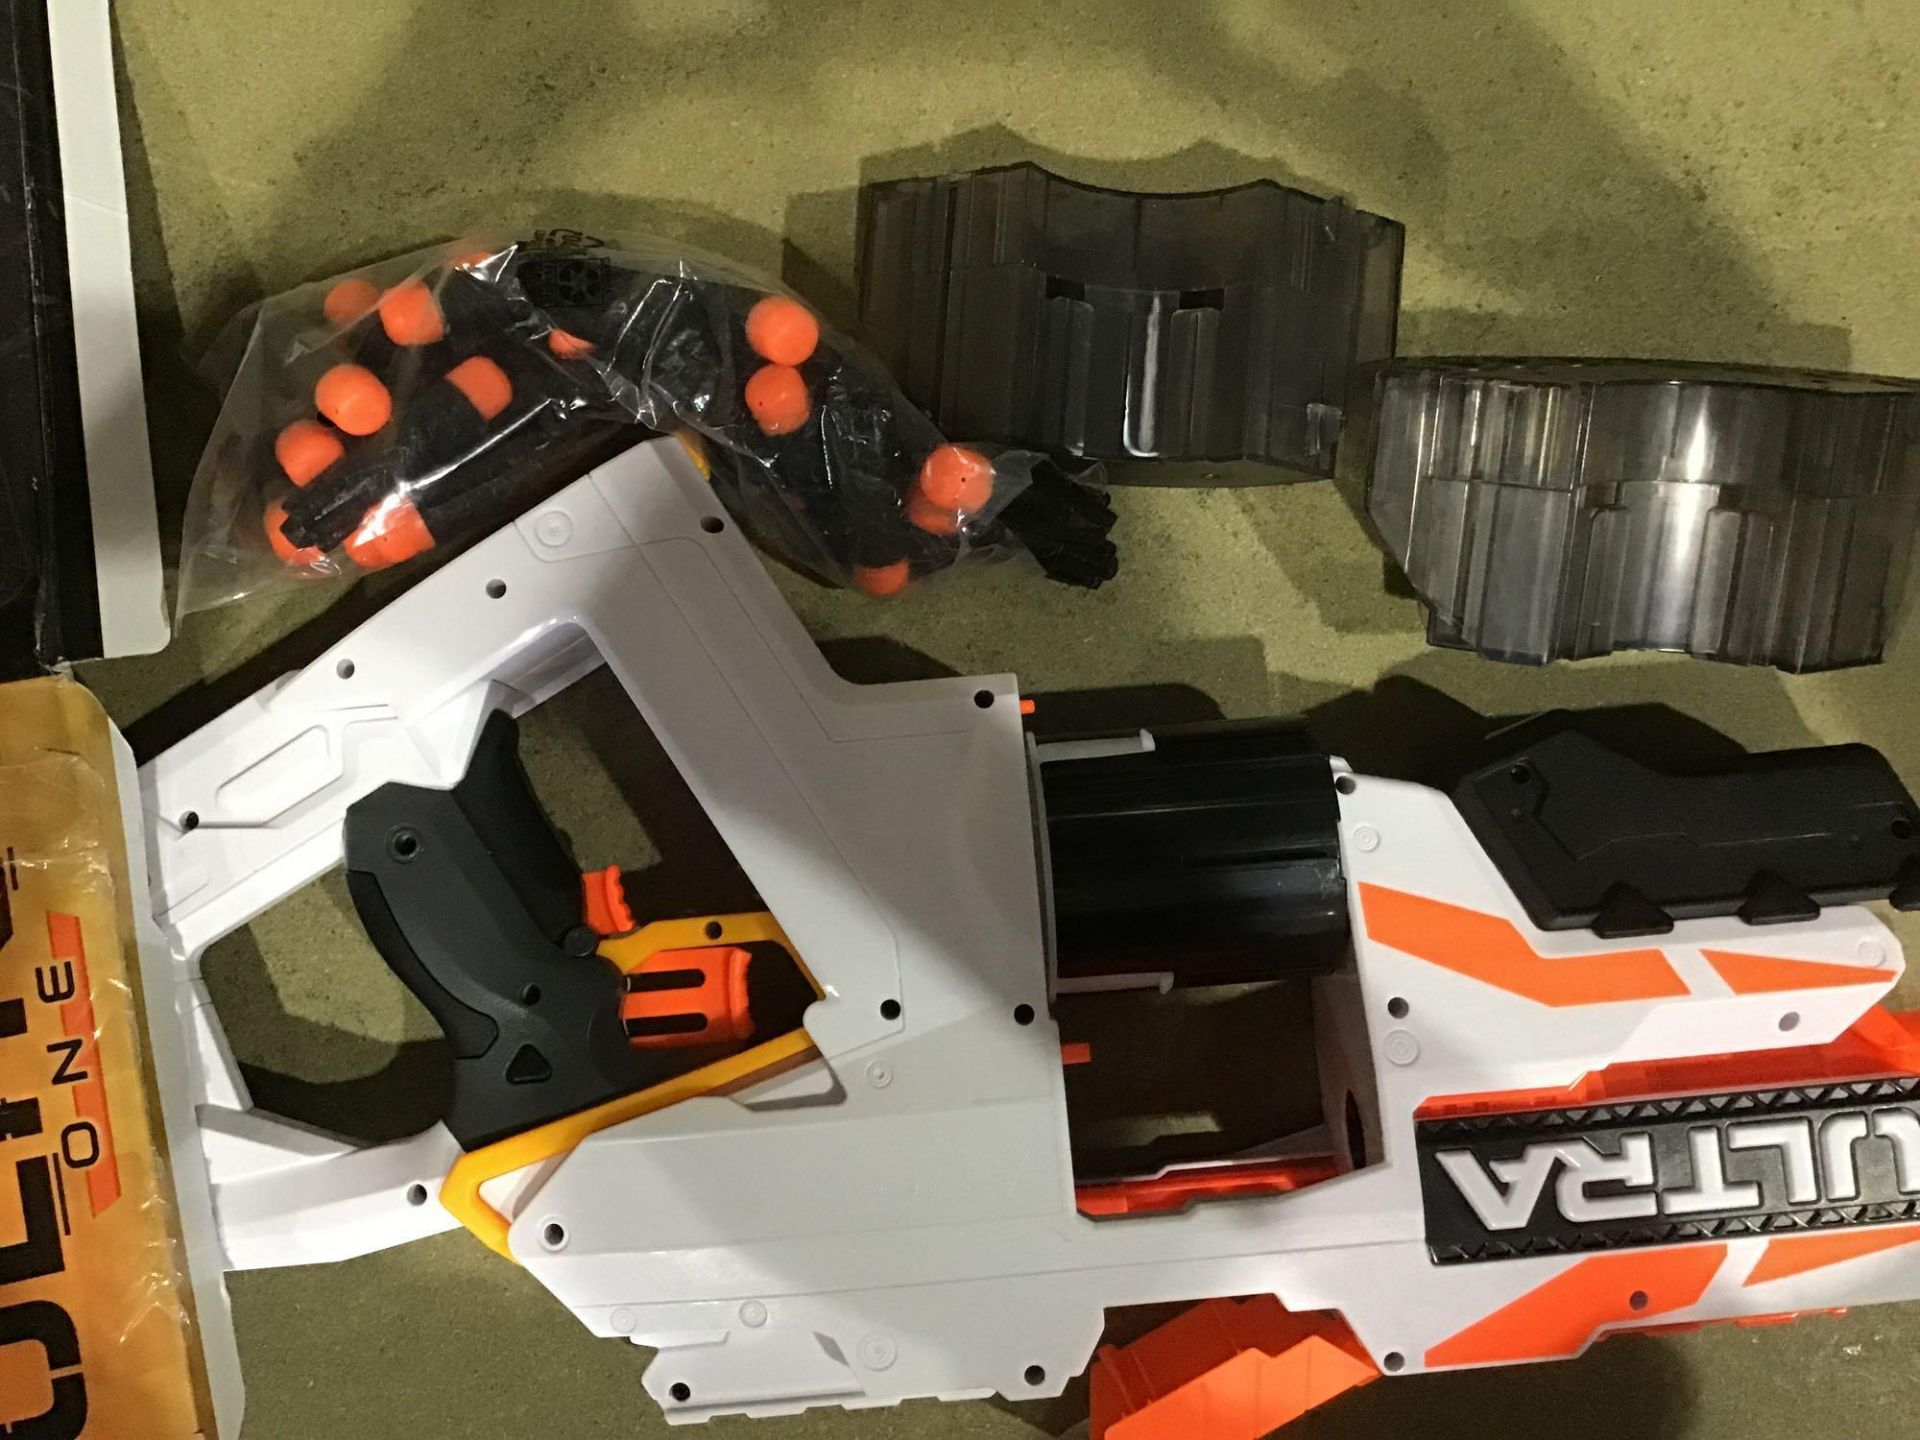 Nerf Ultra One Motorised Blaster, £50.00 RRP - Image 3 of 4